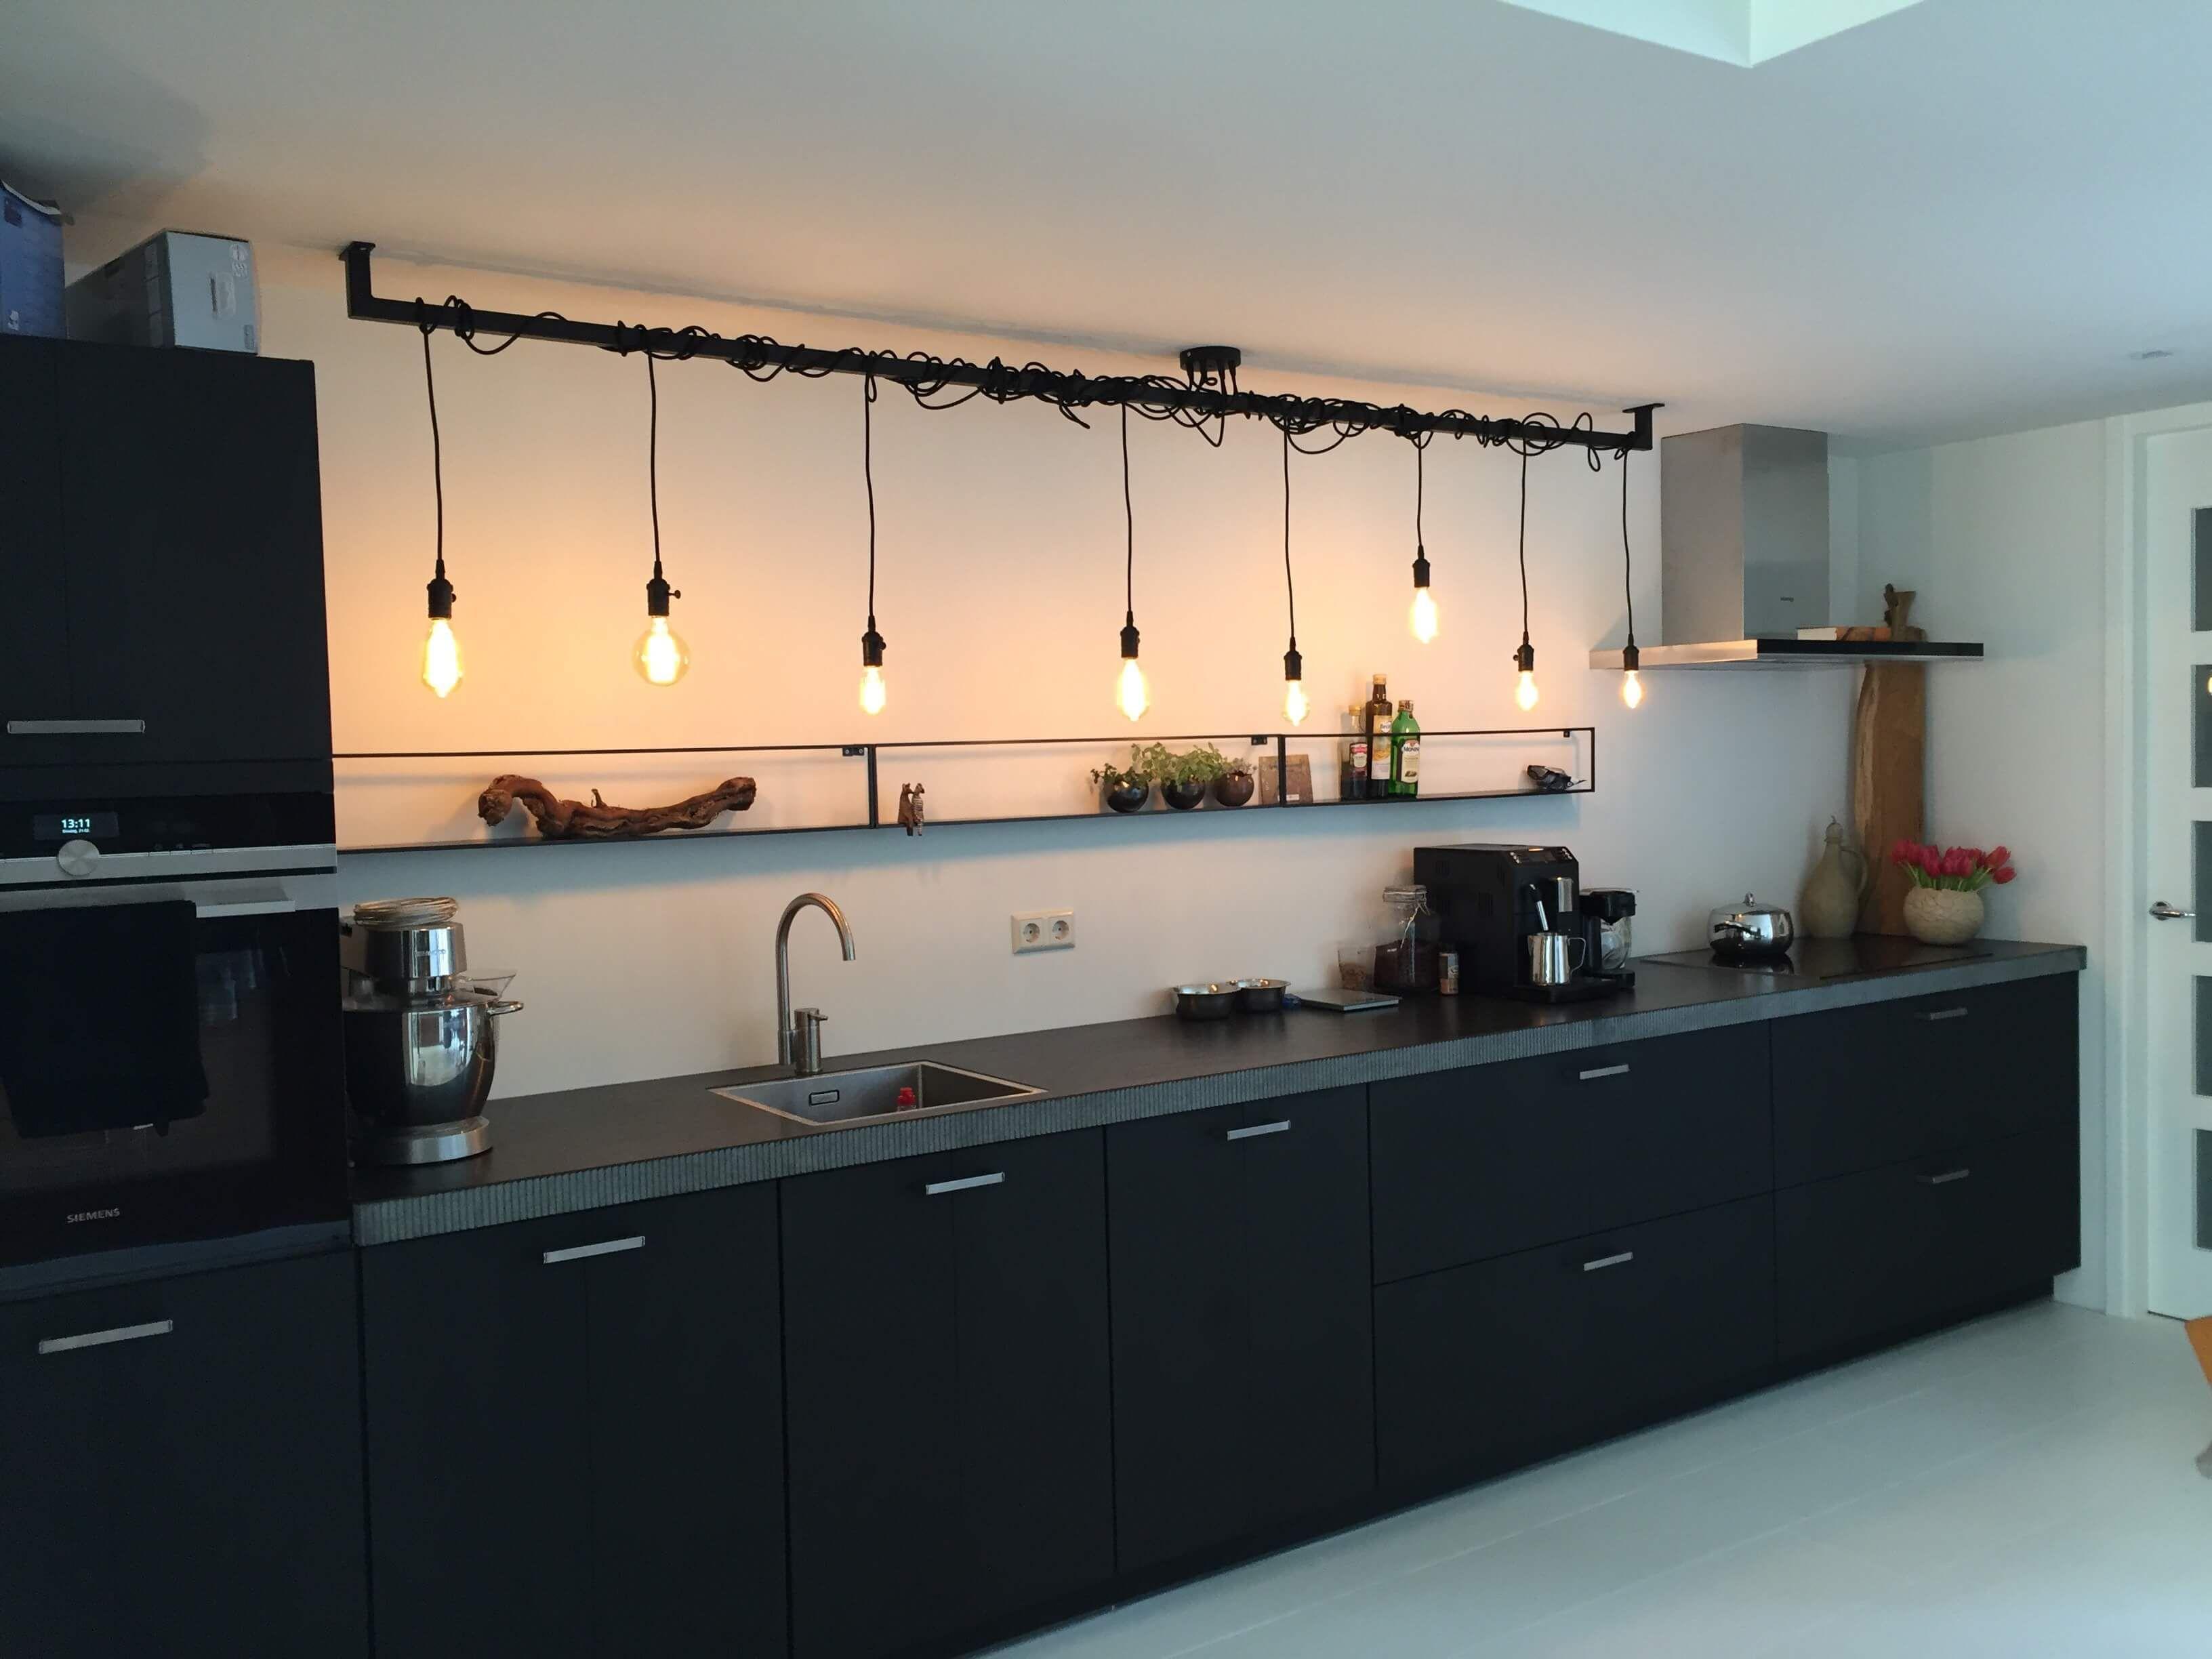 Industriële keuken of eettafel lamp kopen? opvallend industrieel